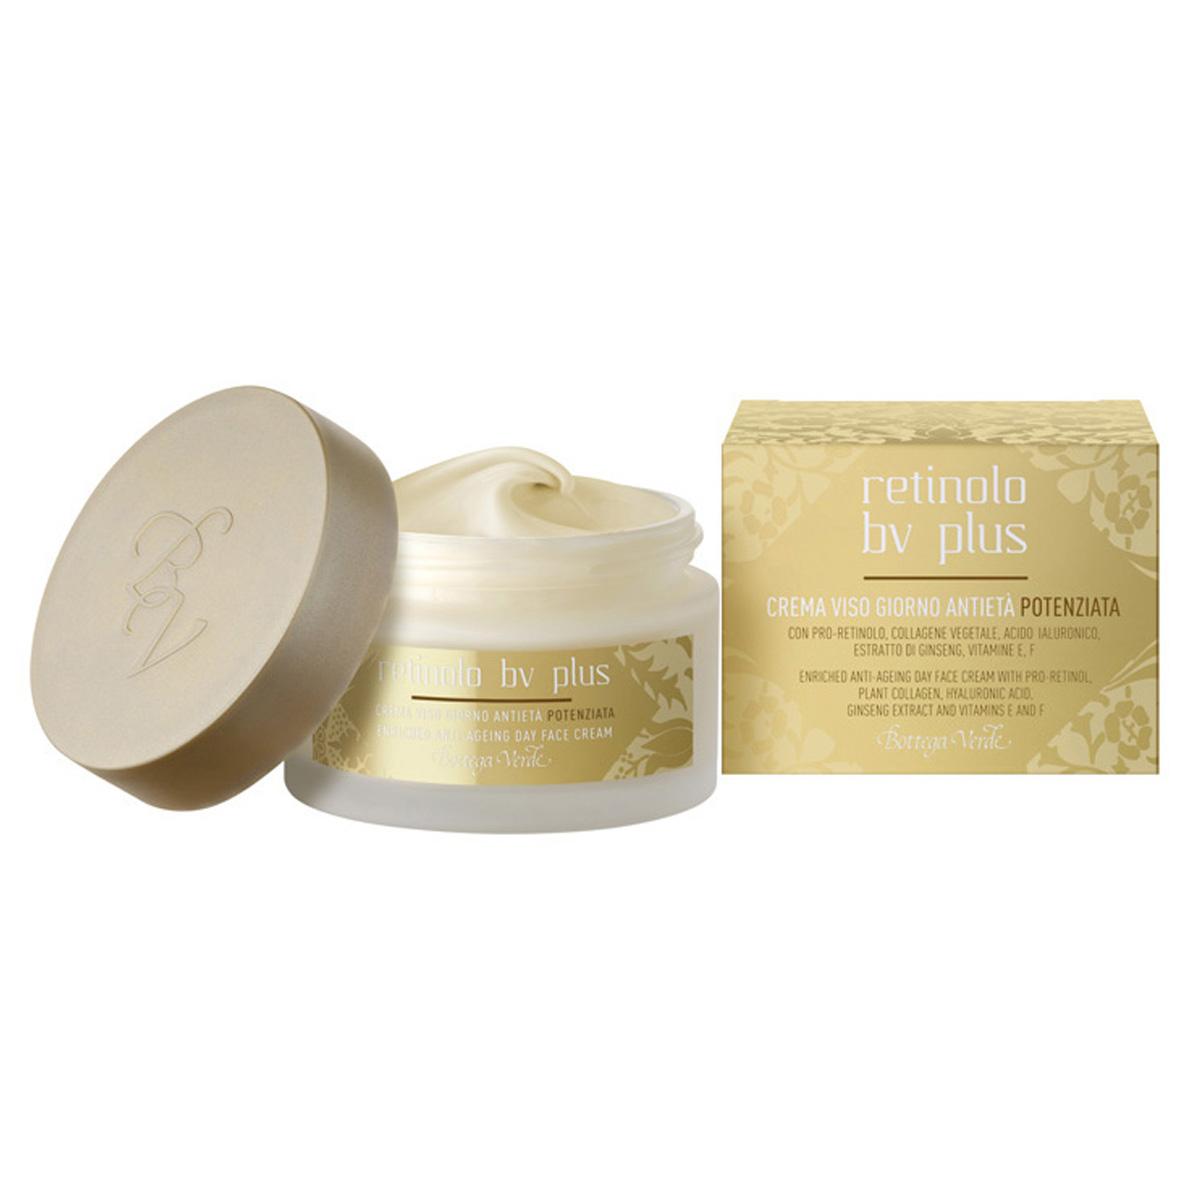 Retinolo Bv Plus - Crema De Fata Pentru Zi   Anti-aging Cu Pro-retinol  Colagen Vegetal  Acid Hialuronic  Extract De Ginseng  Vitamine E  F